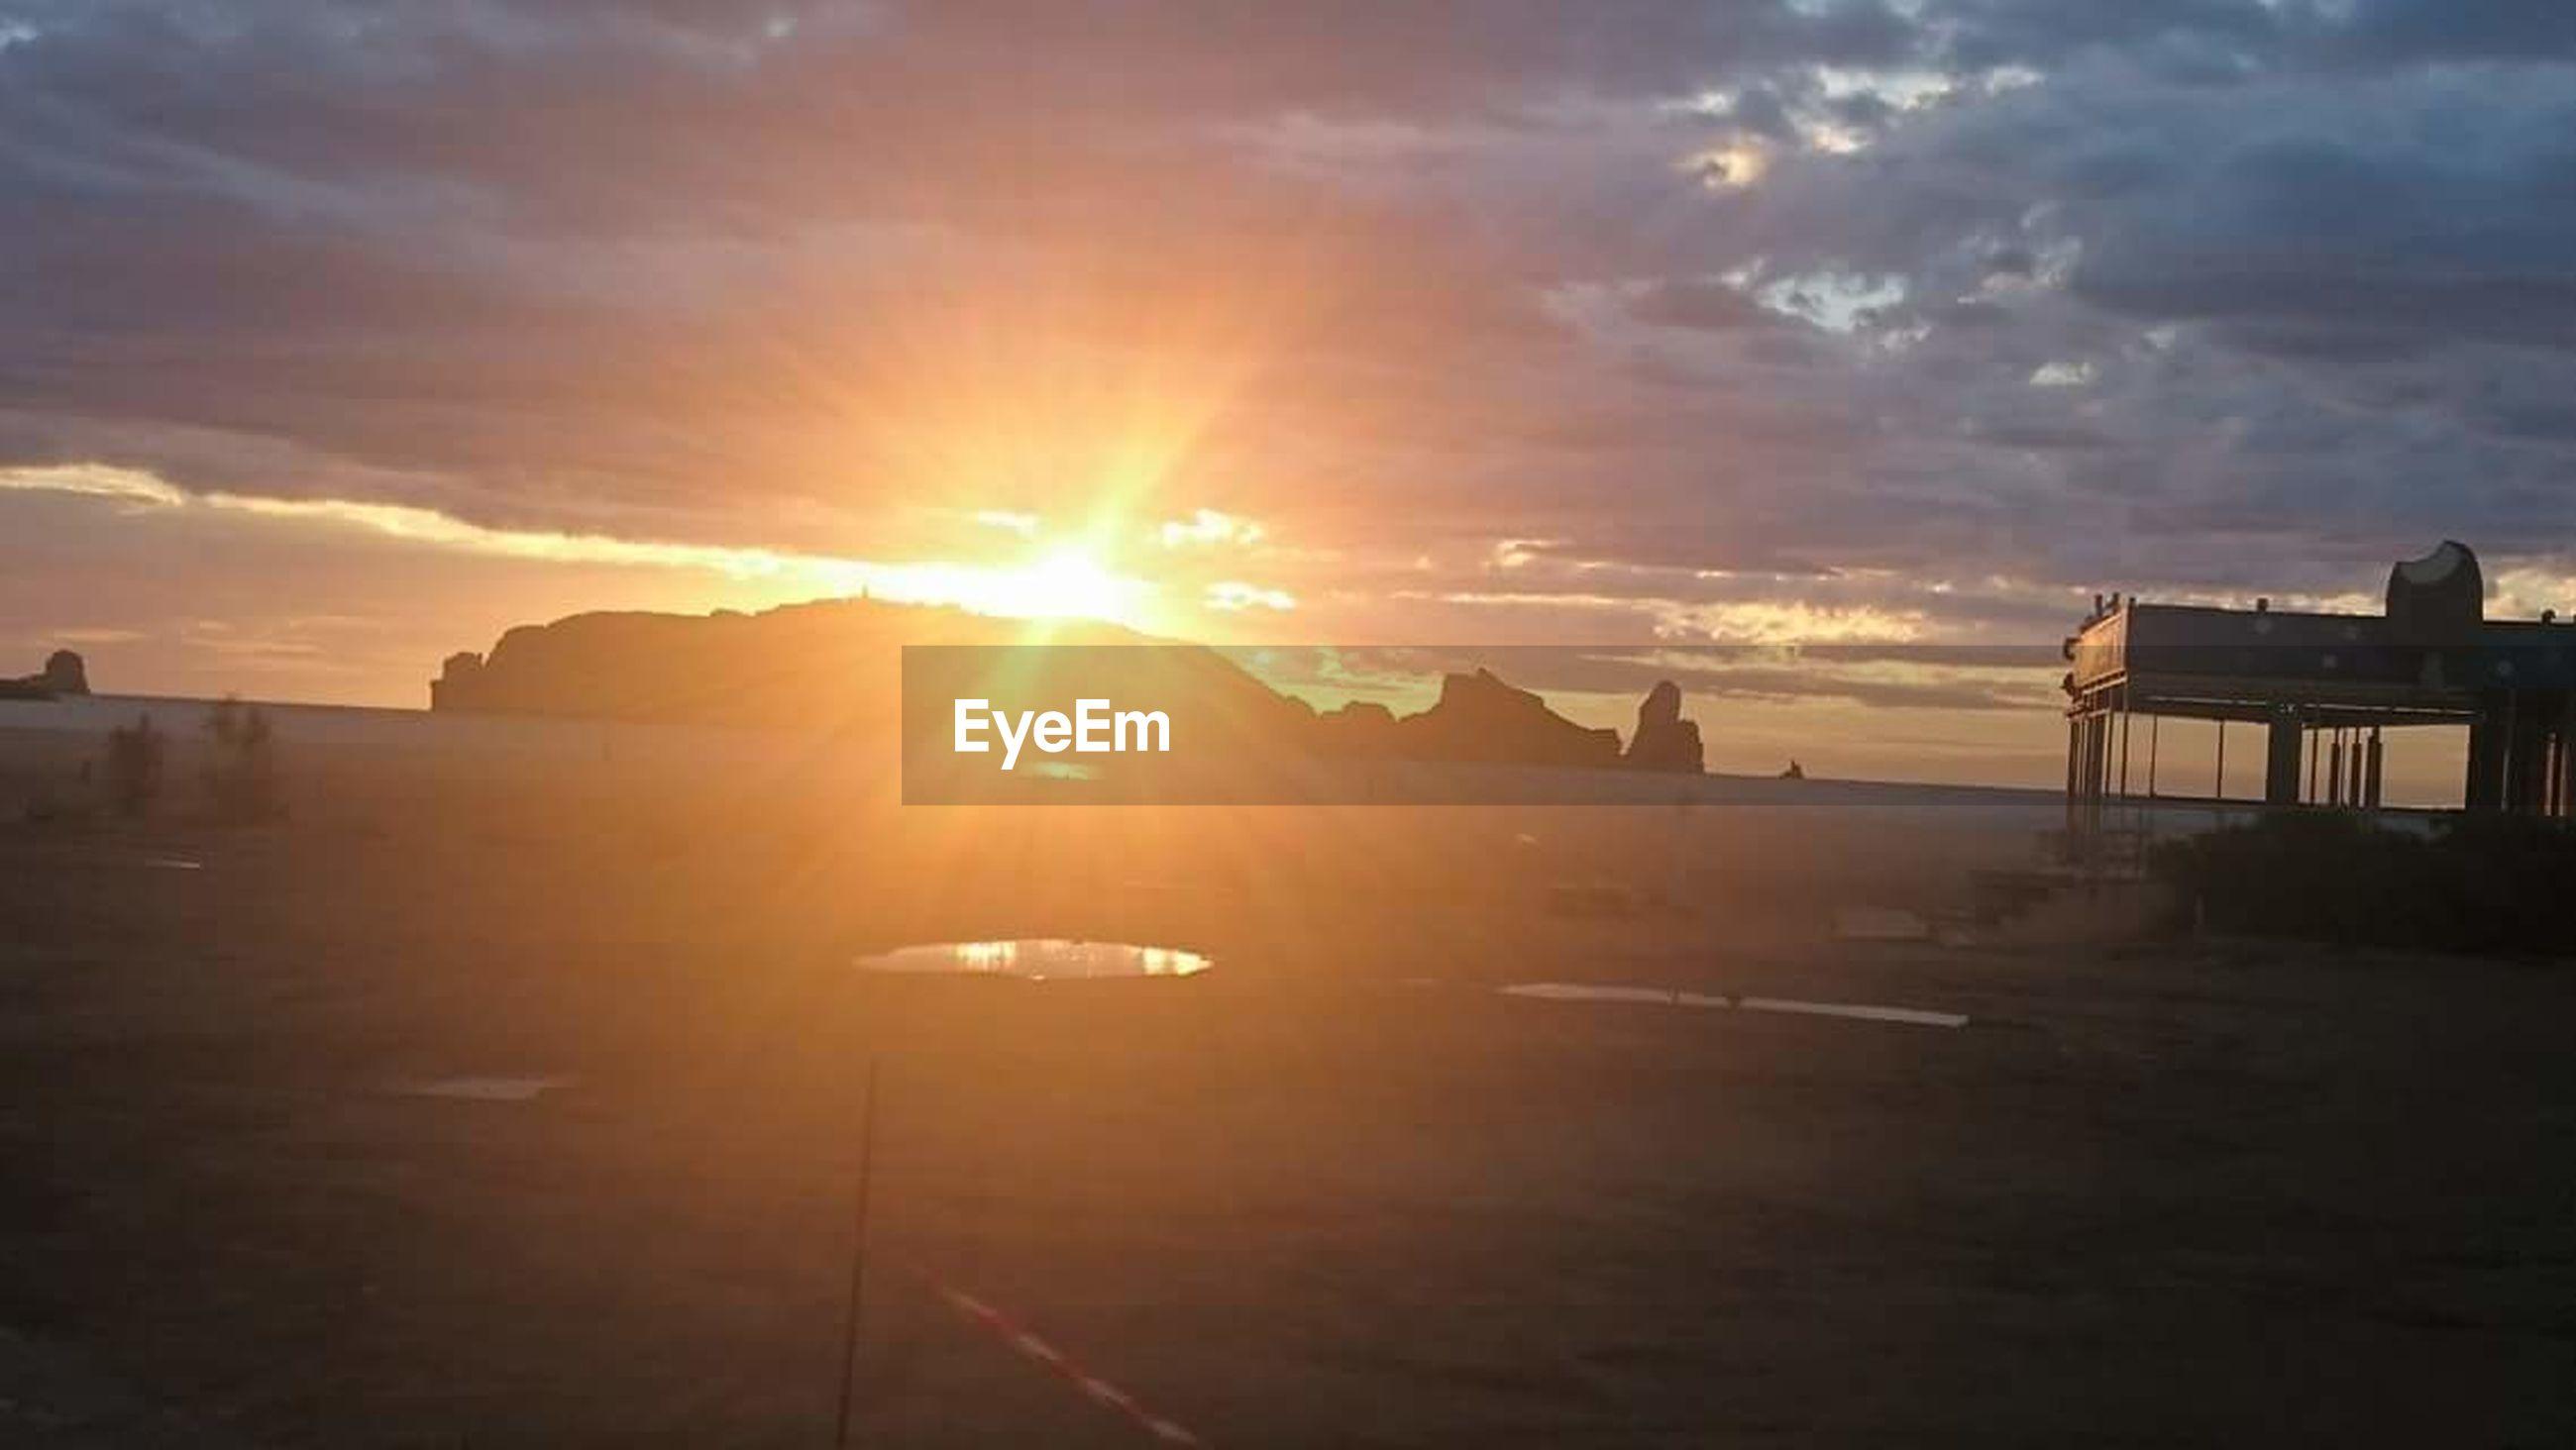 sunset, sky, cloud - sky, beauty in nature, sea, outdoors, nature, scenics, sunbeam, water, sun, no people, architecture, beach, day, passenger boarding bridge